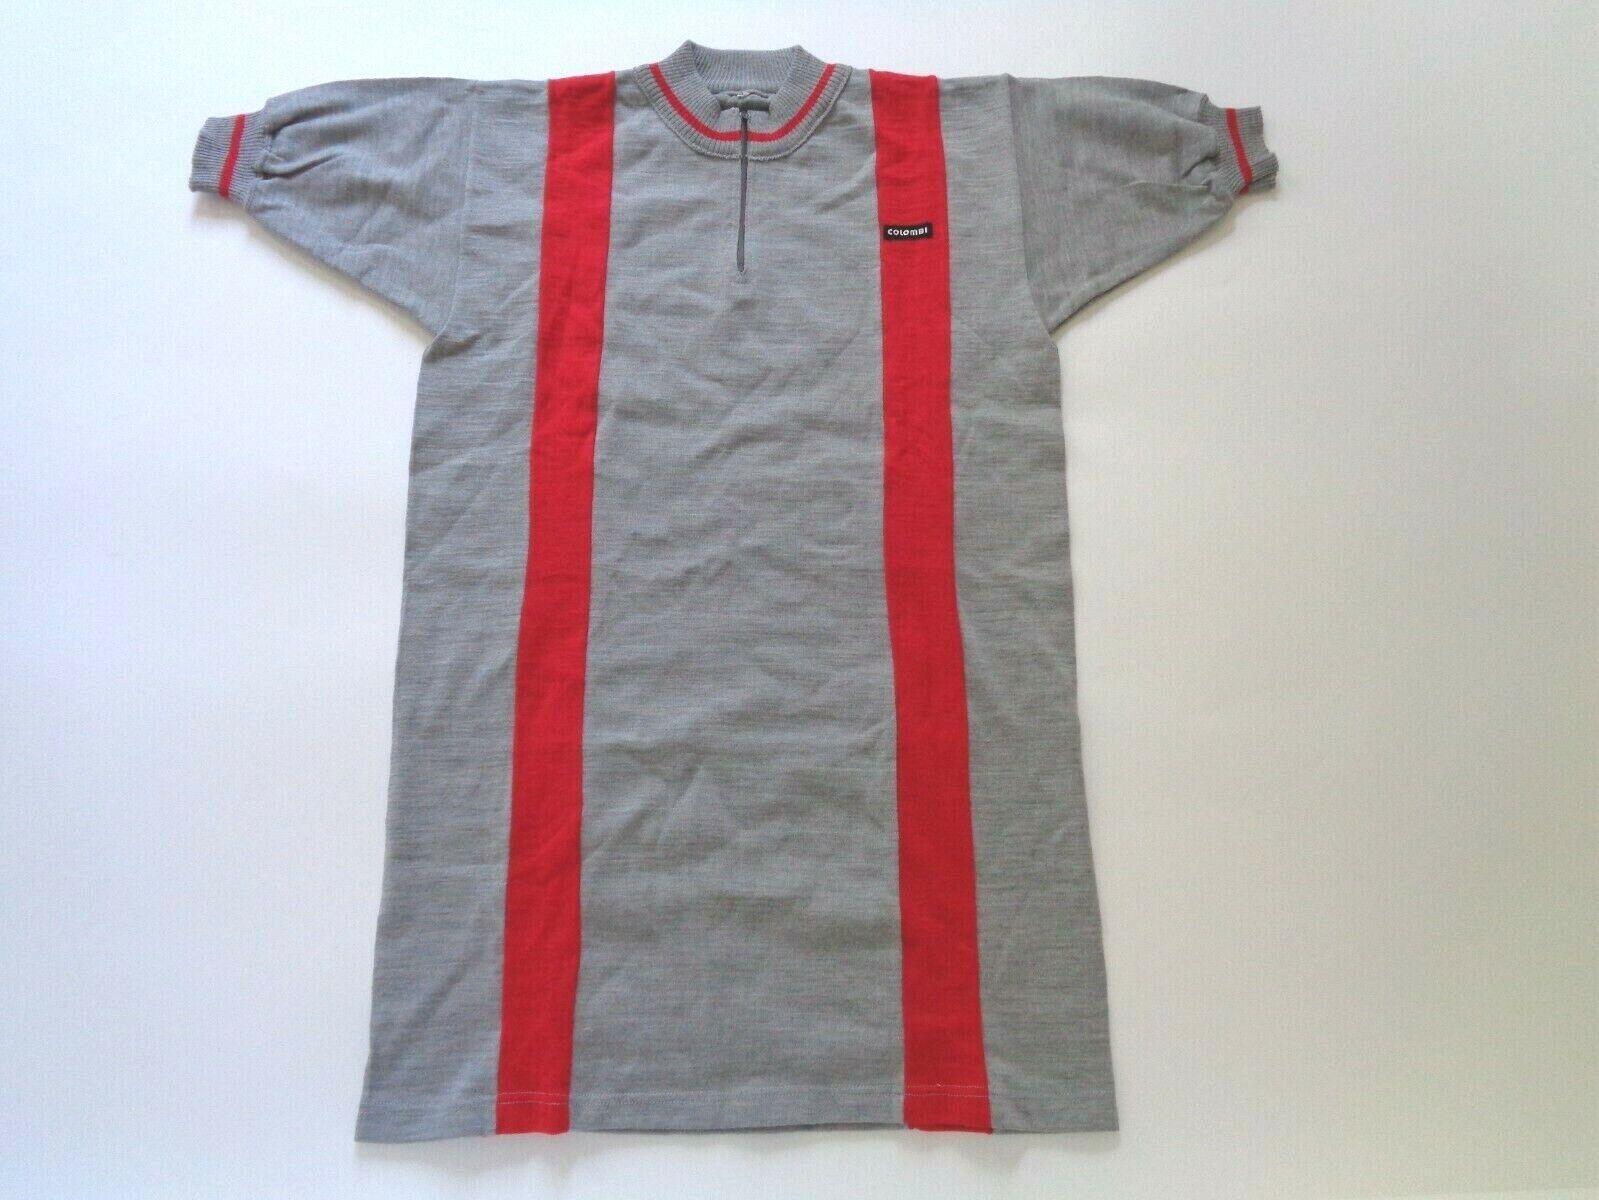 Nos Vintage 1970s80s COLOMBI Italiano Lana Cycle Jersey grigiorosso Medium